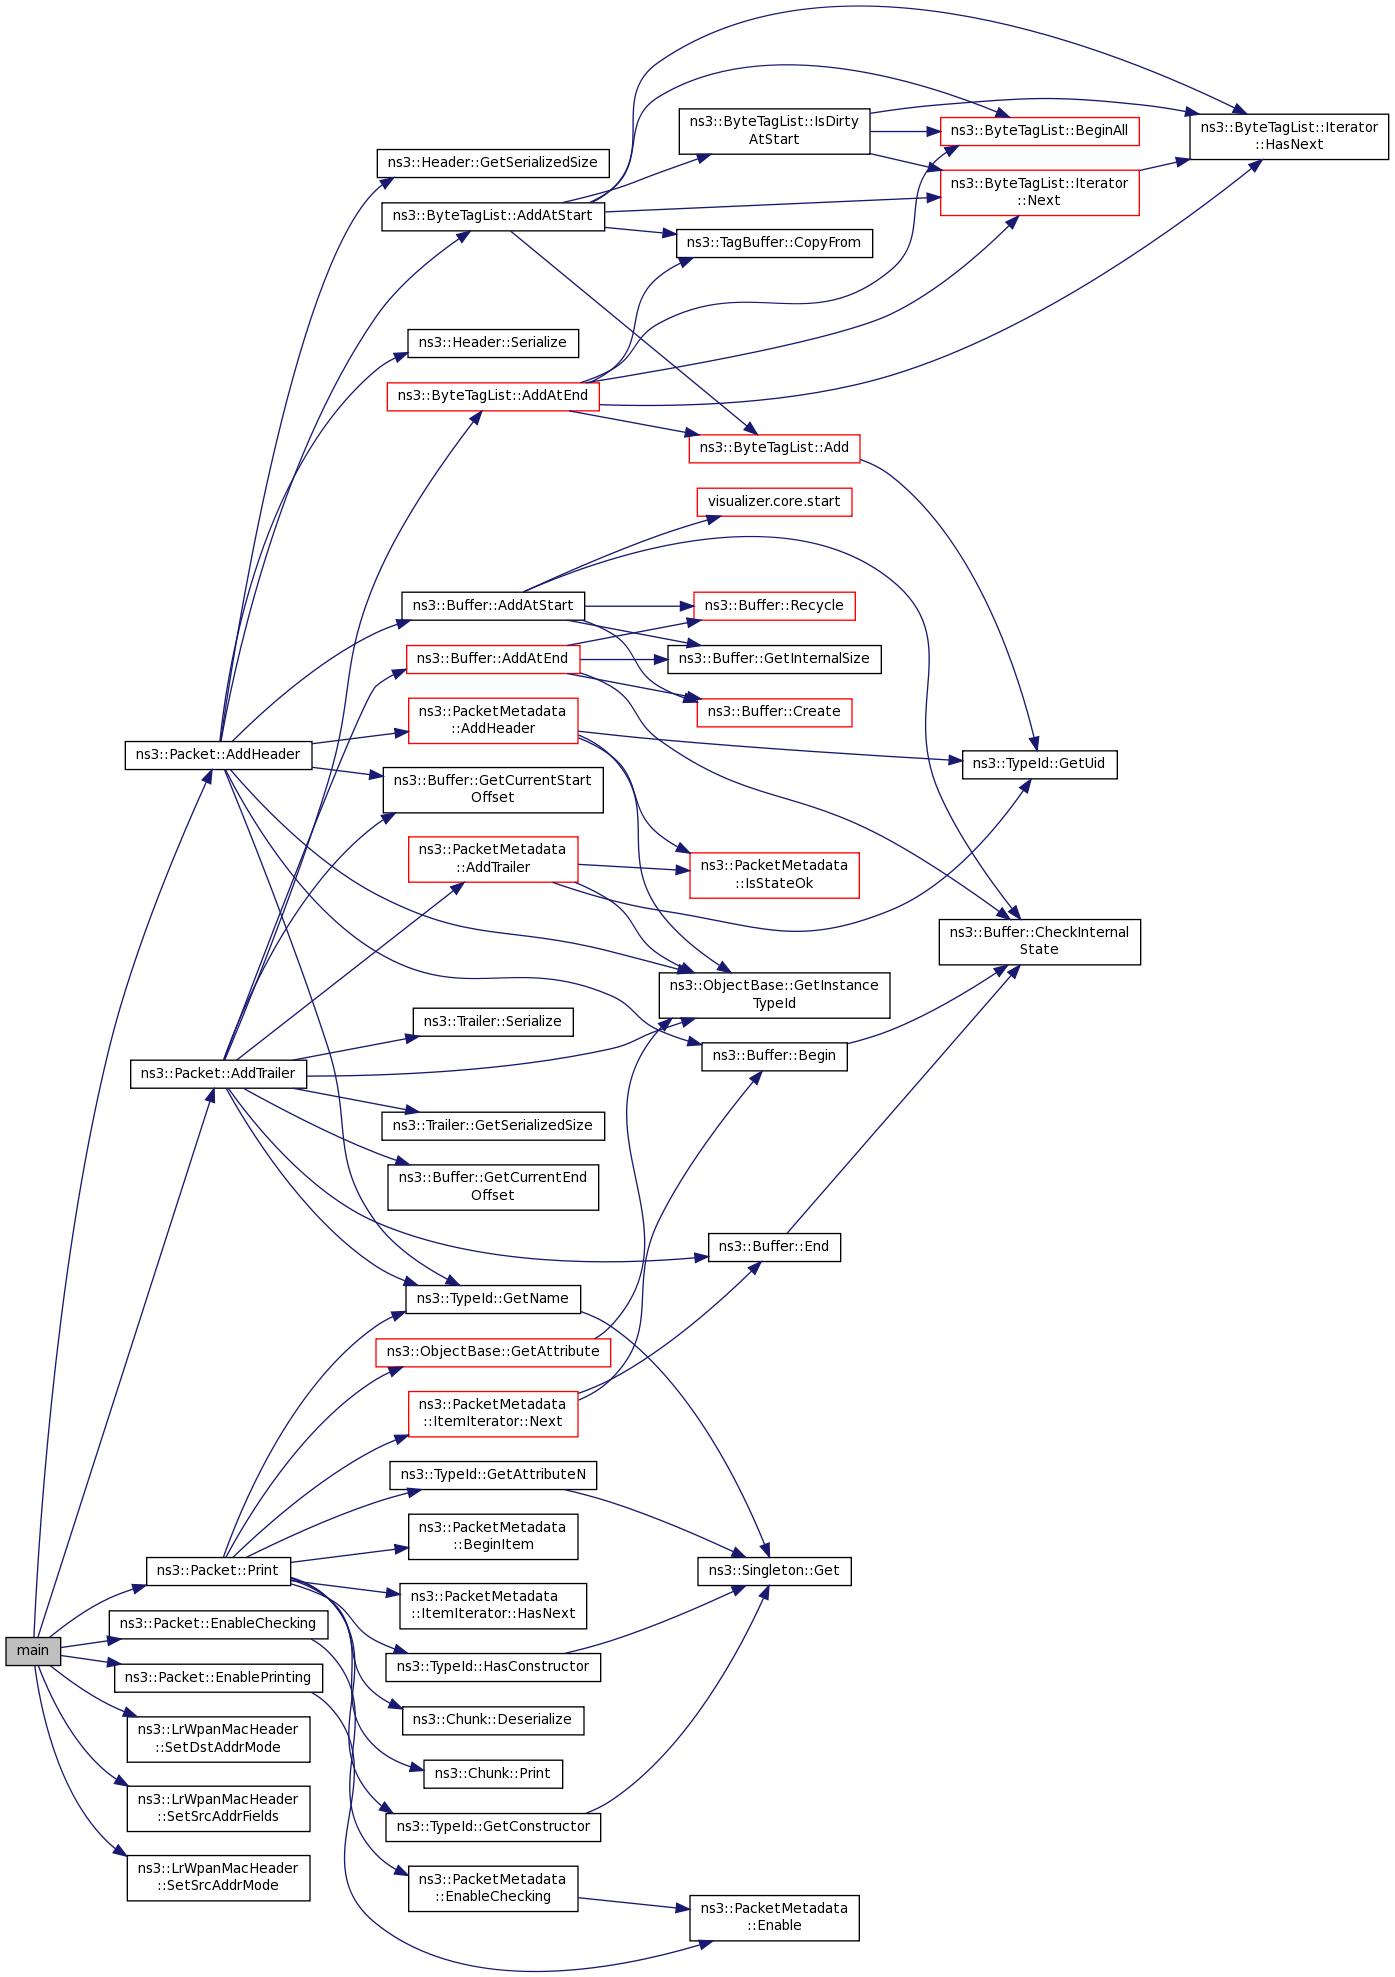 ns-3: src/lr-wpan/examples/lr-wpan-packet-print.cc File